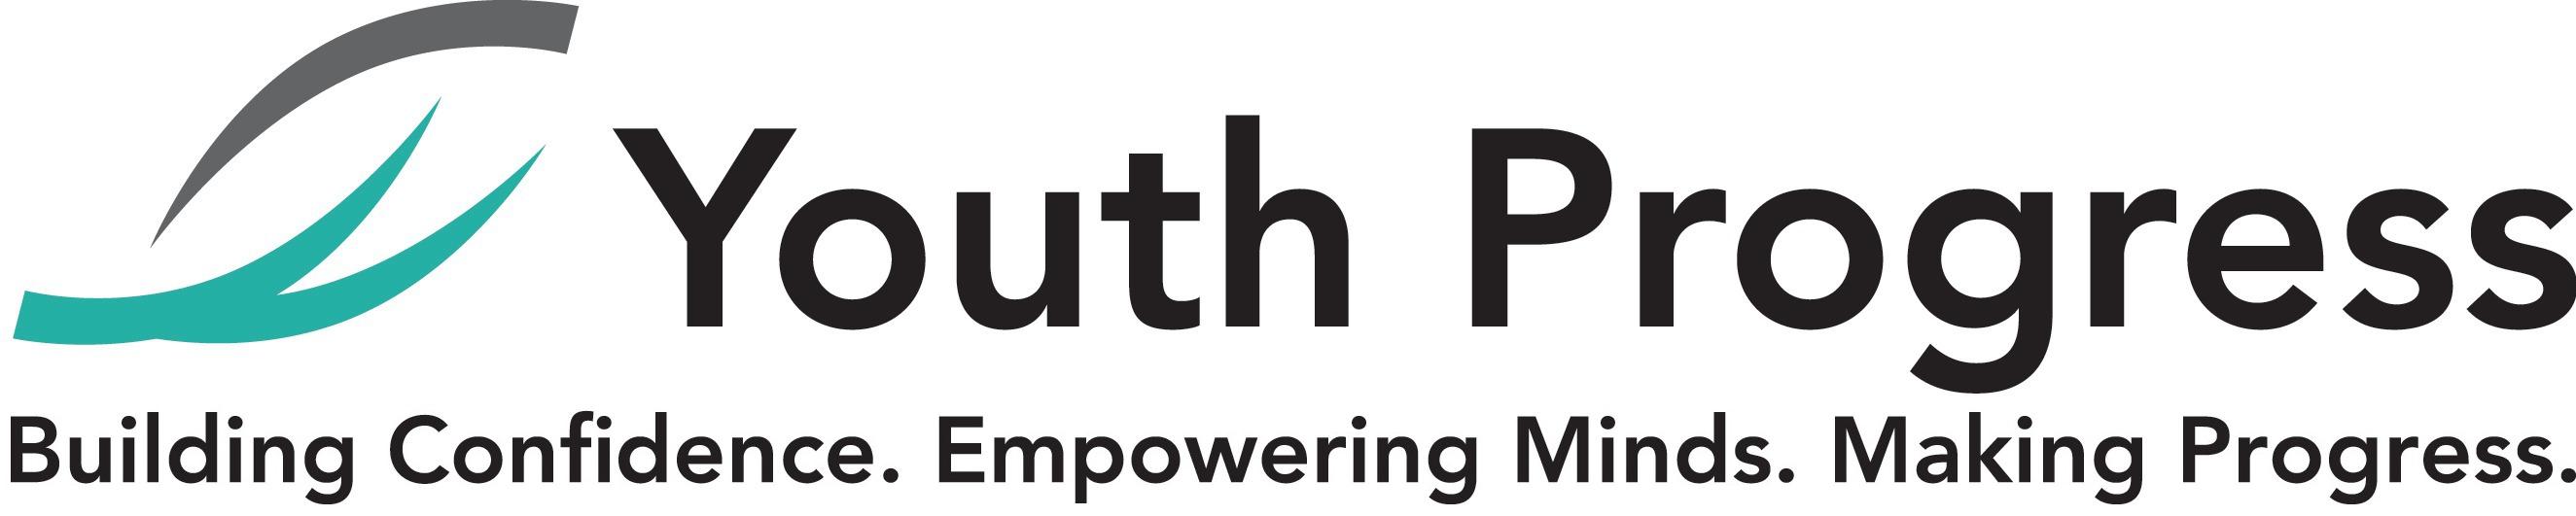 Youth Progress